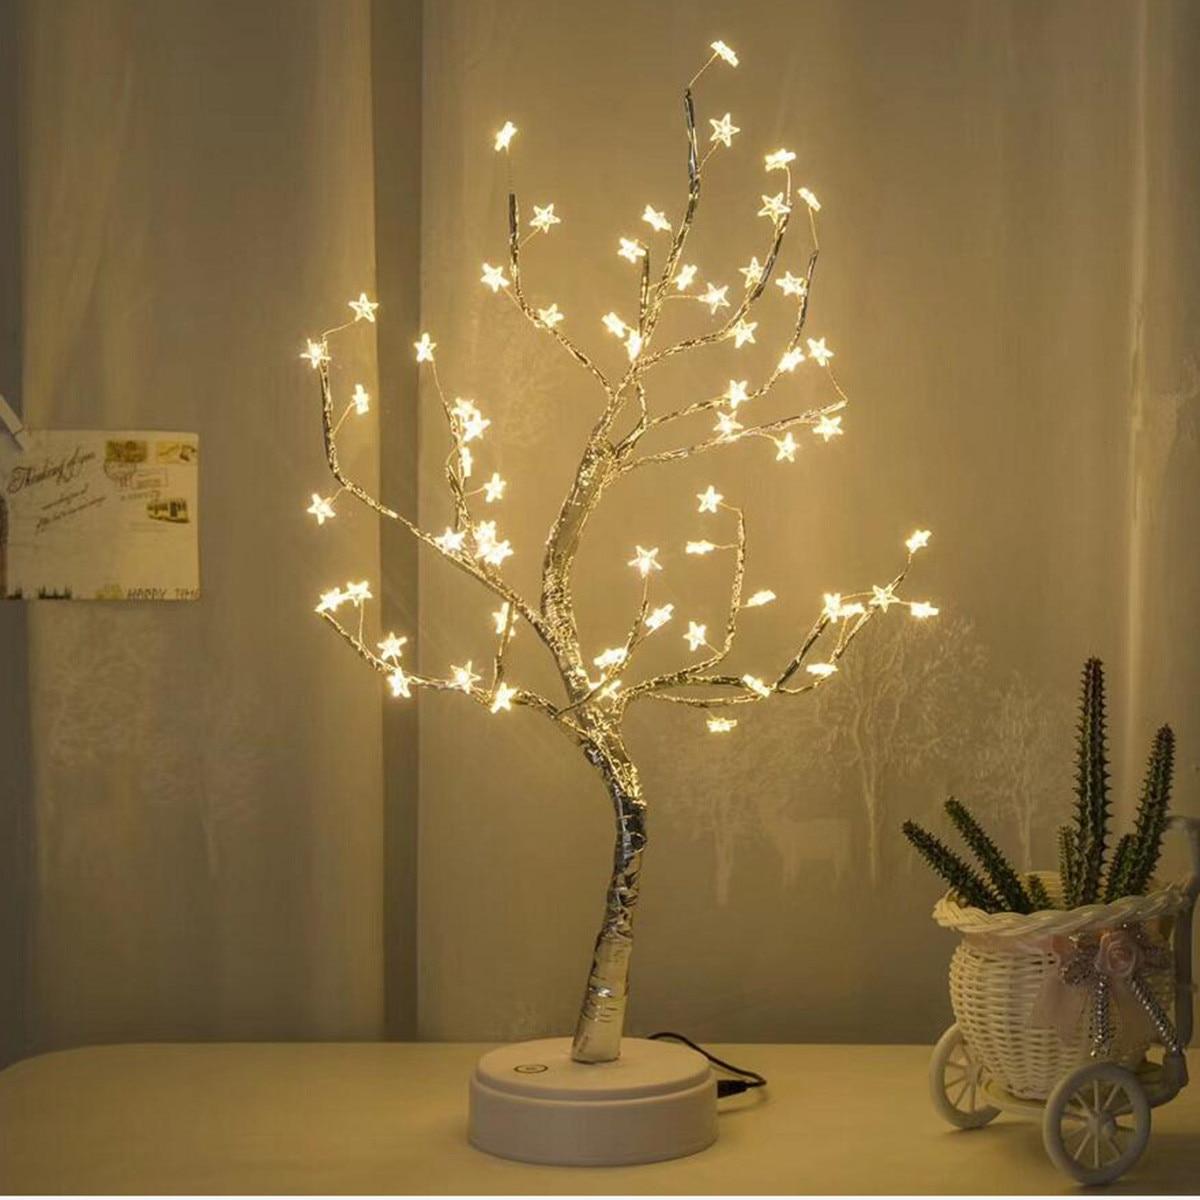 >Original ALIWARM White LED With 60 White Star <font><b>Table</b></font> <font><b>Lamp</b></font> For Home <font><b>Decoration</b></font> Wedding Bedroom Dropshipping 20